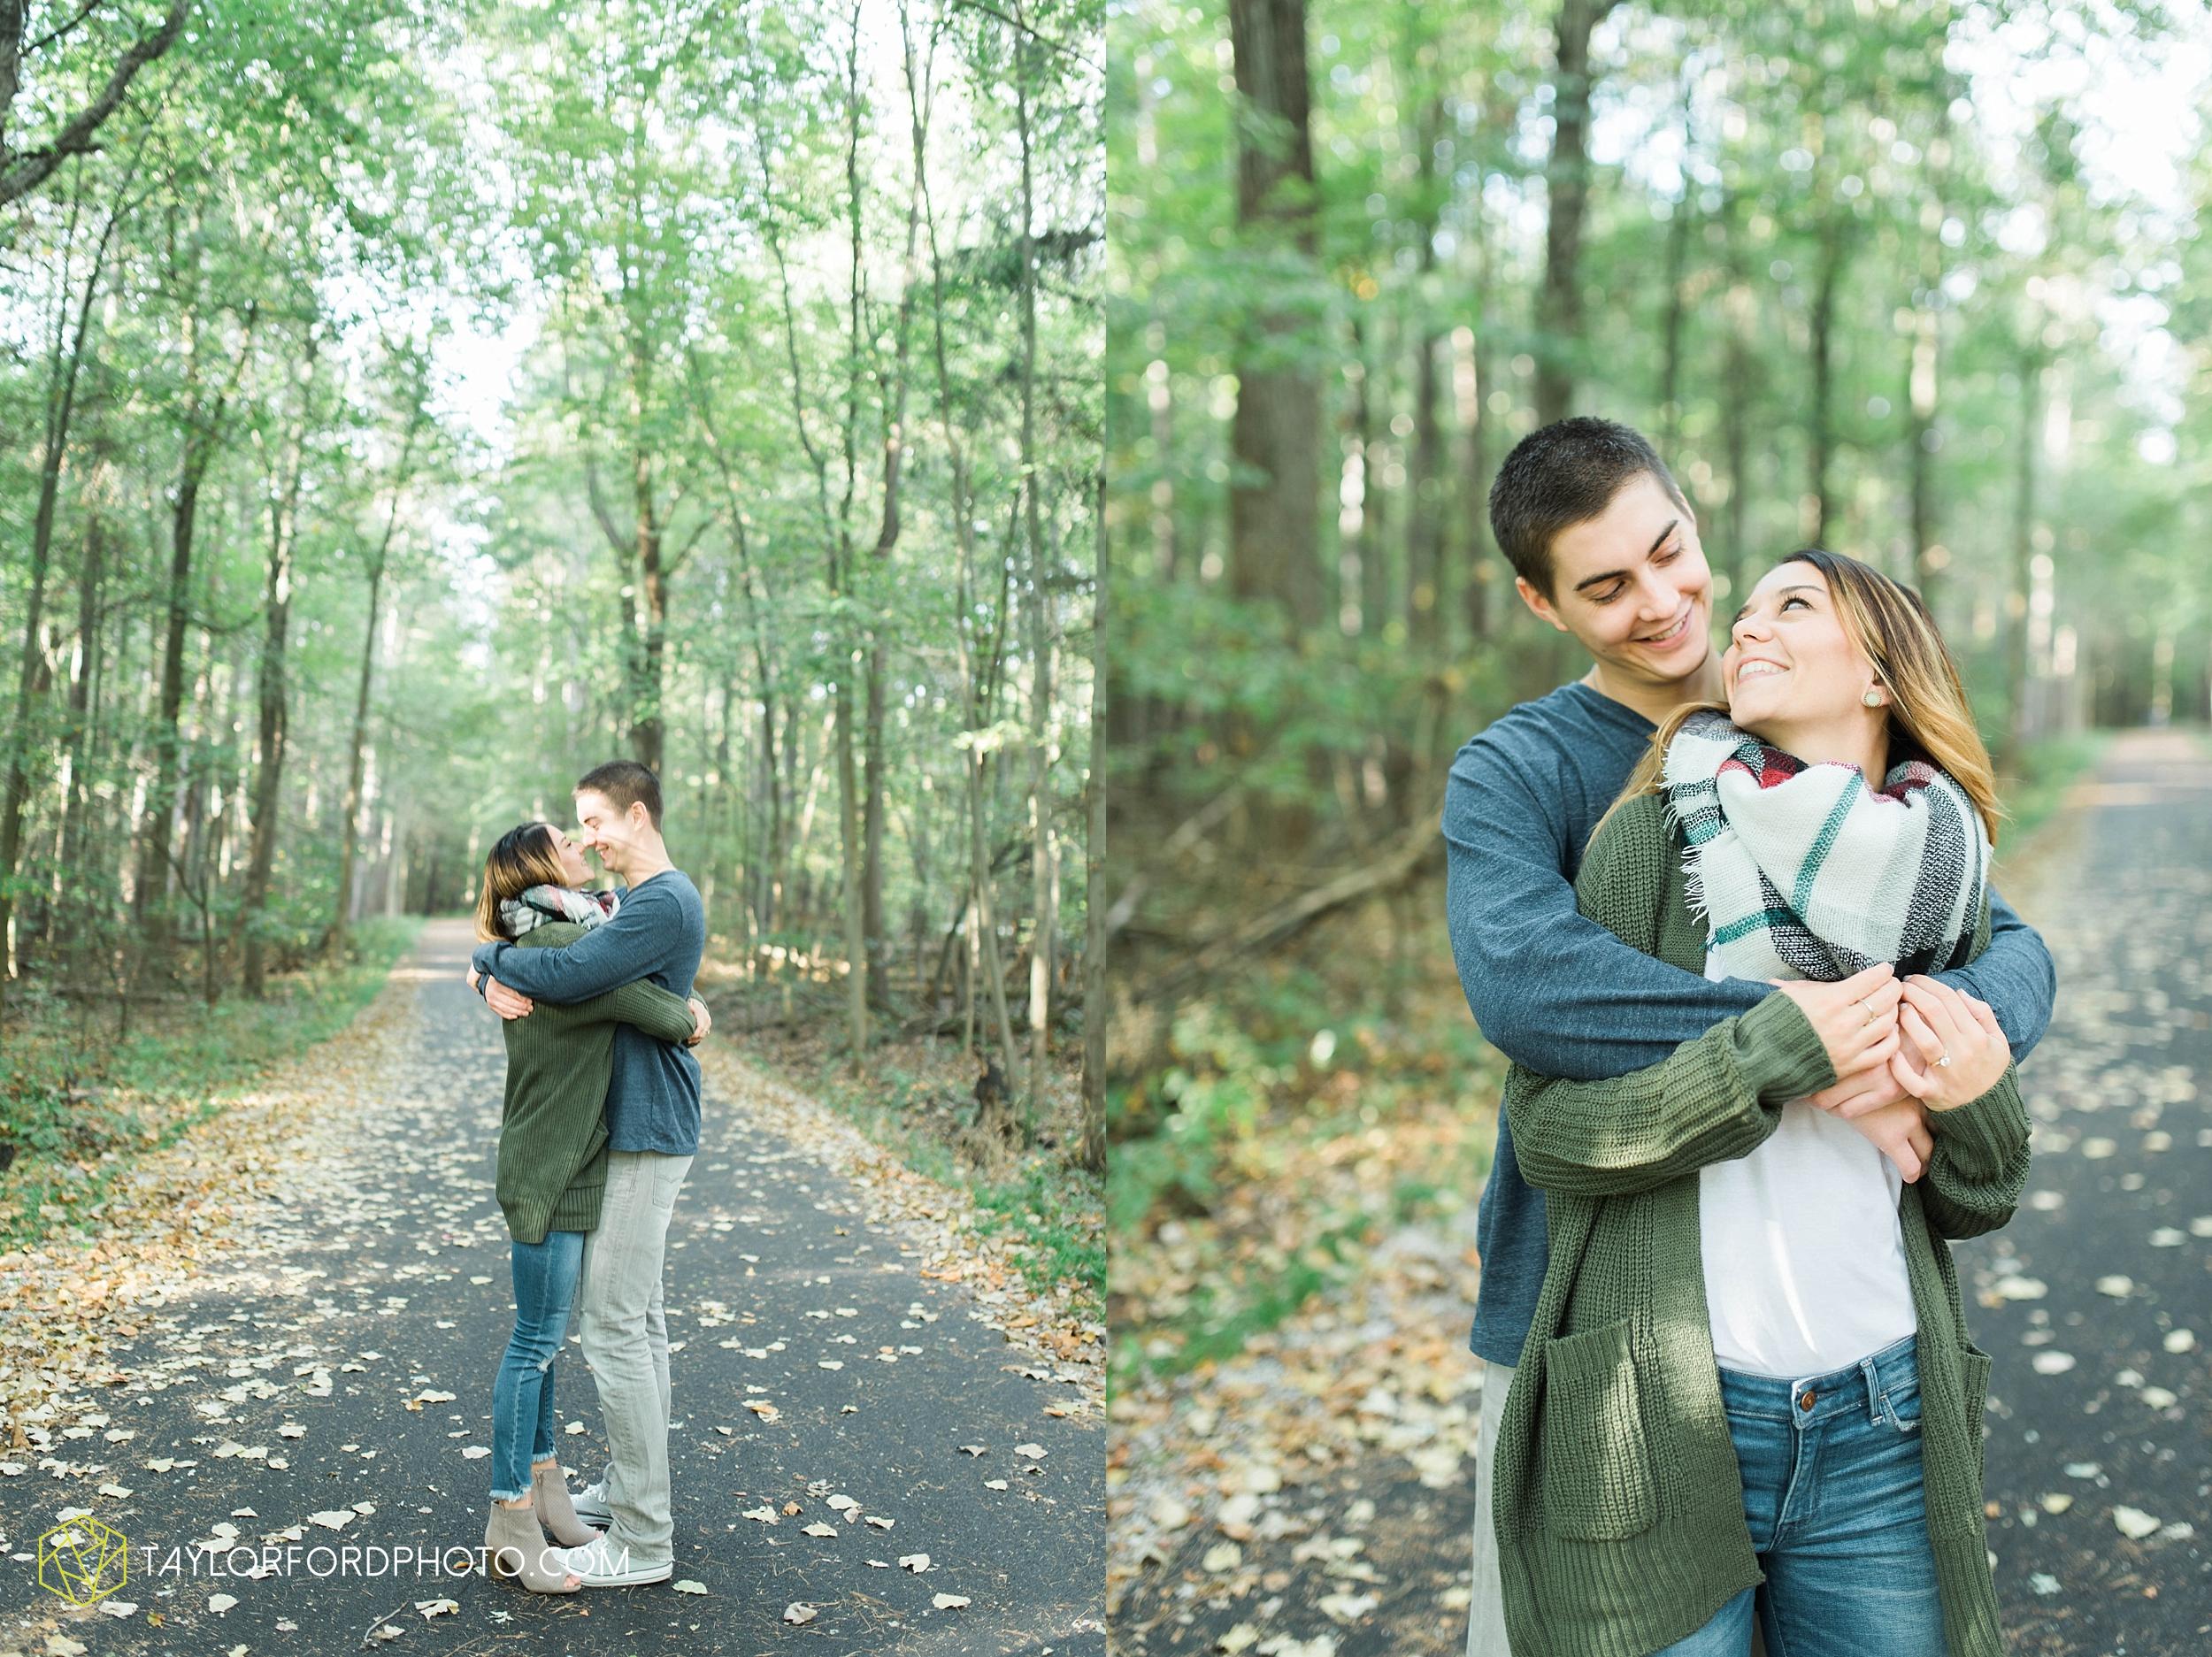 toledo-ohio-engagement-wedding-photographer-Taylor-Ford-Photography-oaks-openings-toledo-metro_3661.jpg